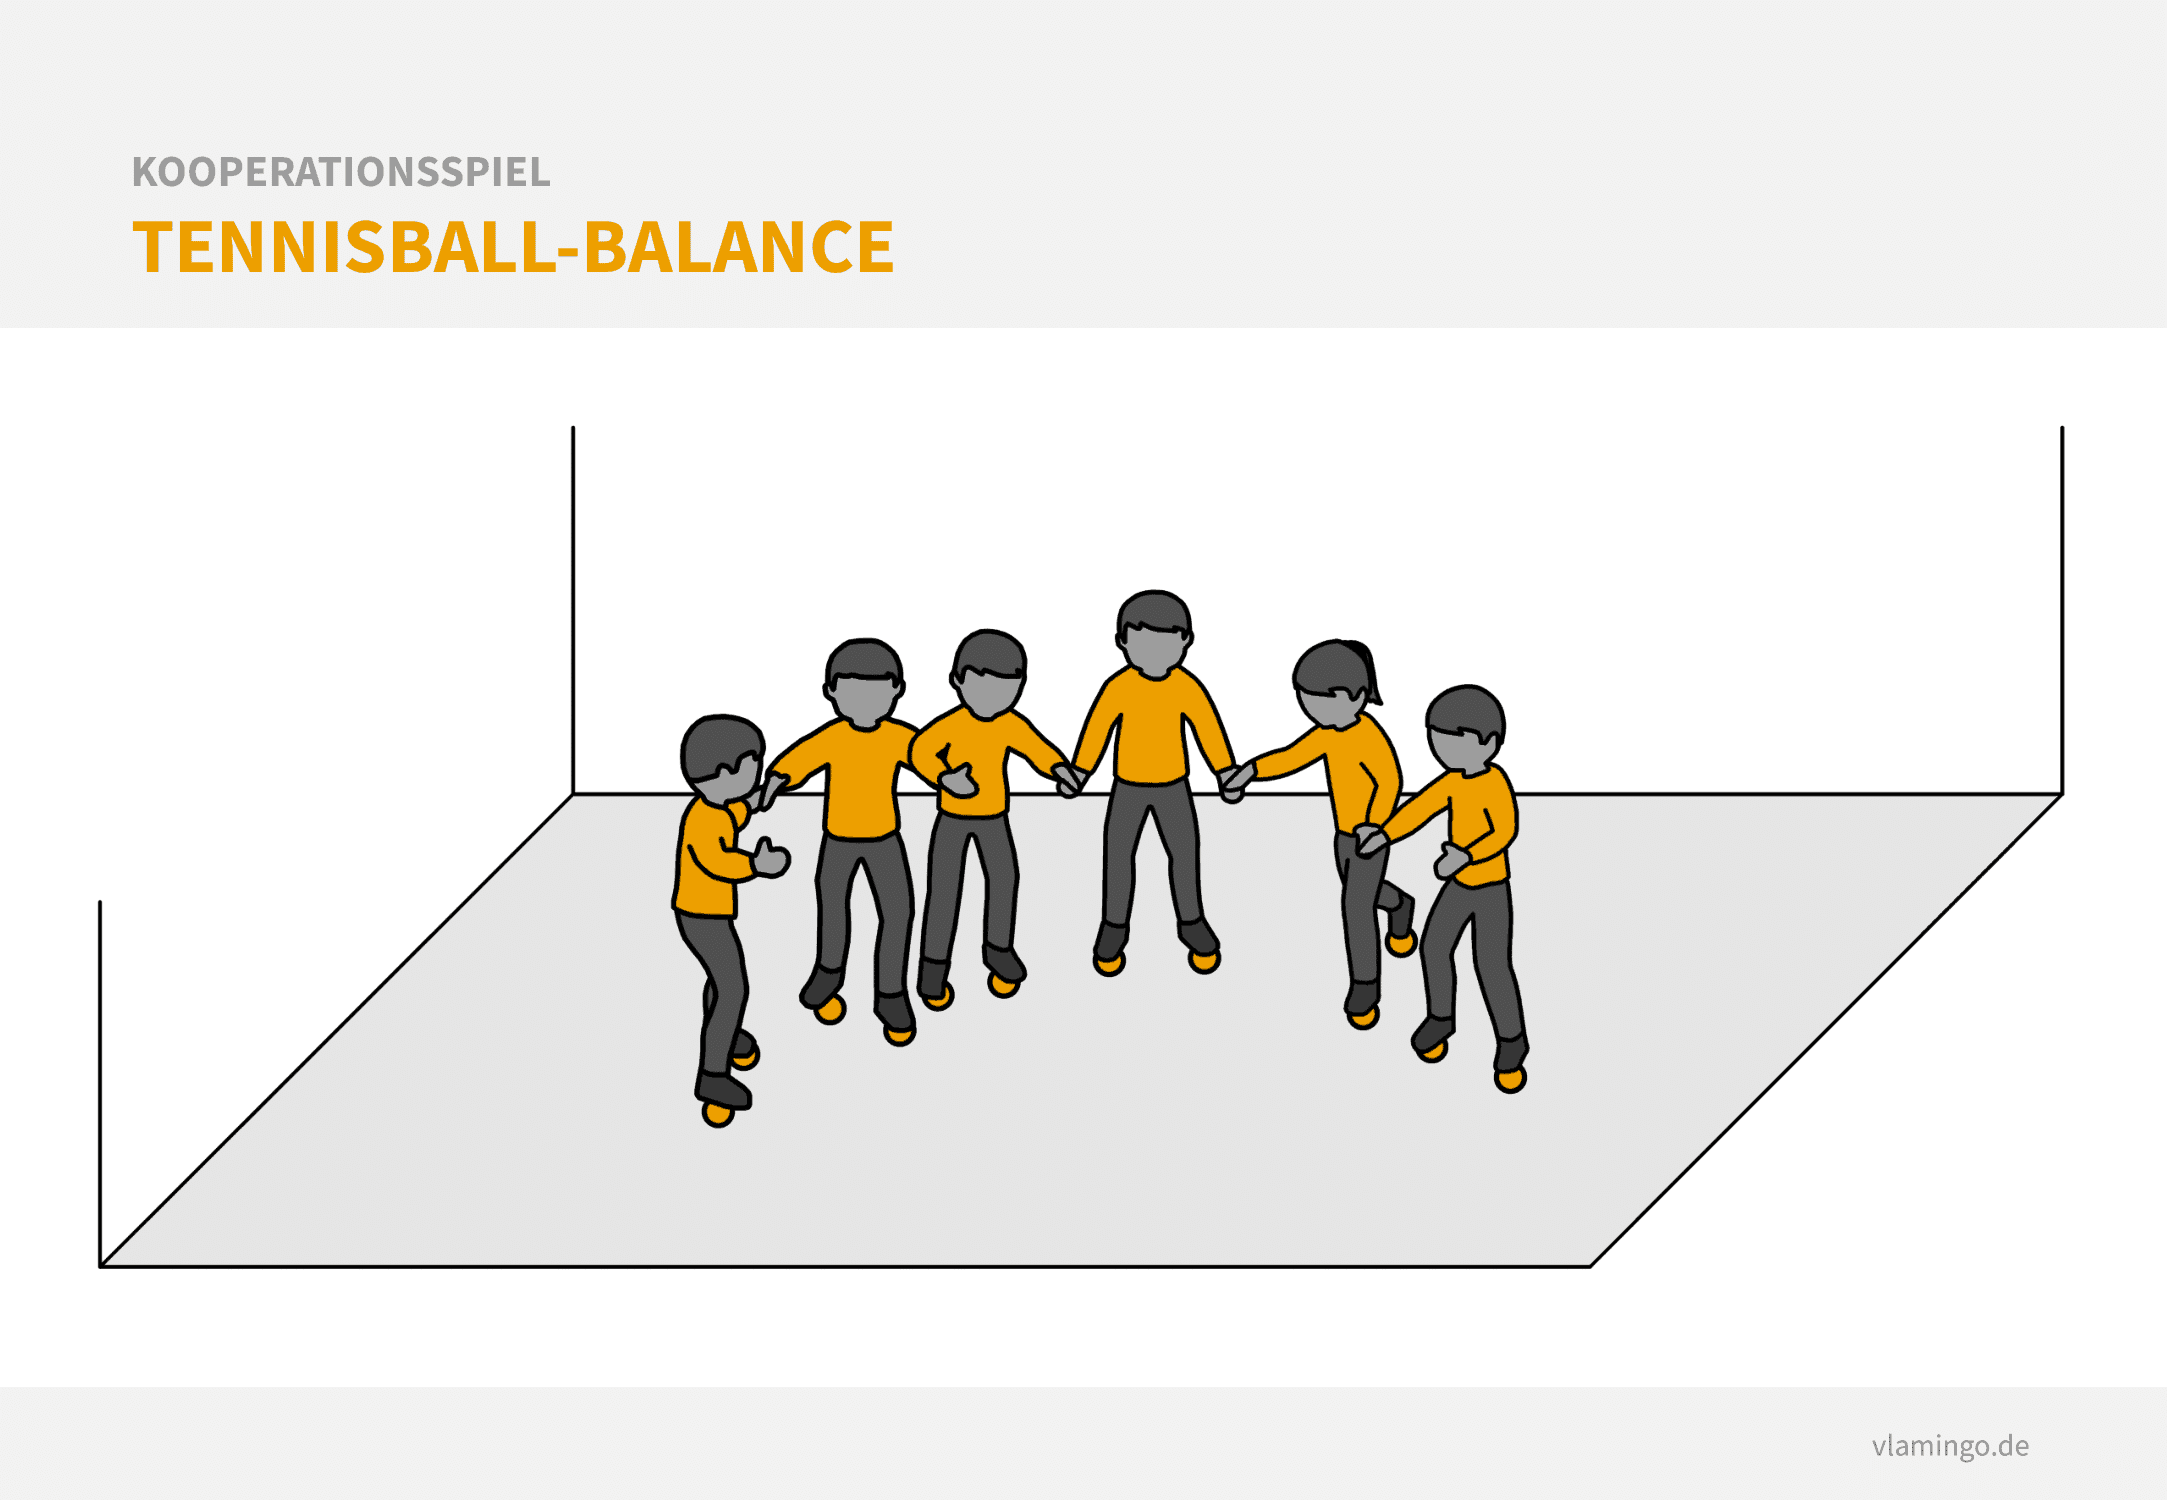 Kooperationsspiel: Tennisball-Balance